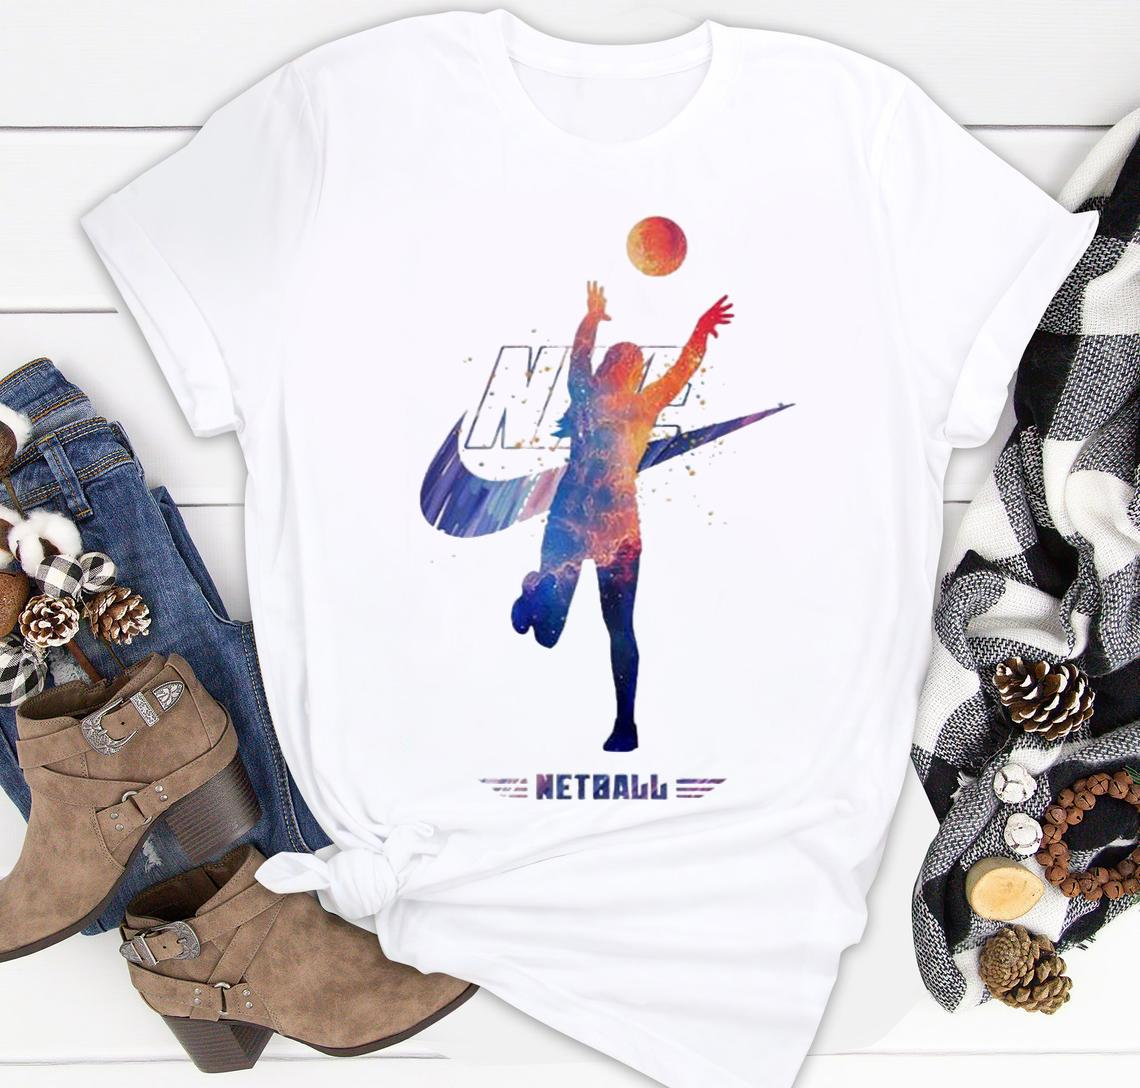 netball nike logo classic shirt